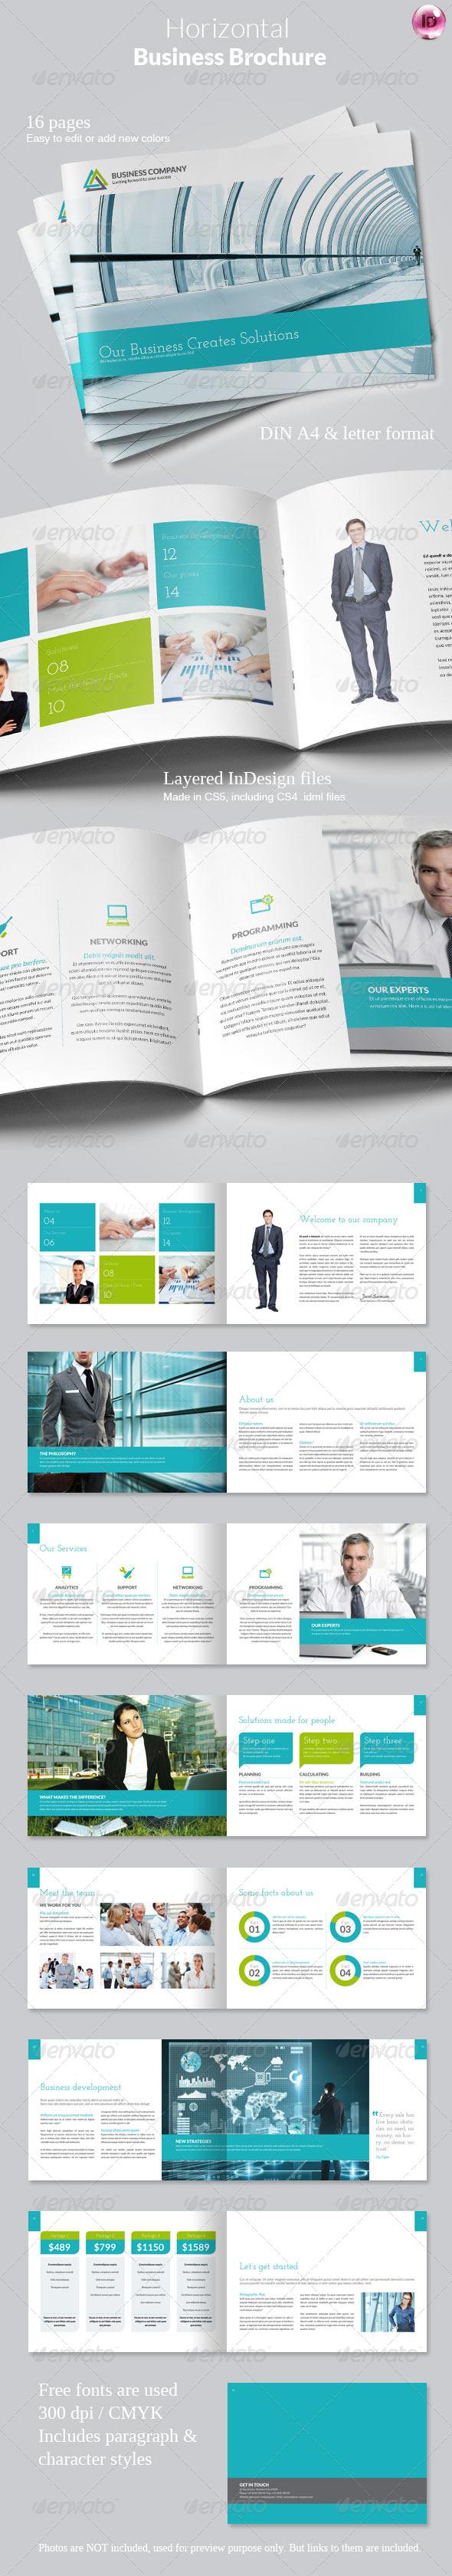 GraphicRiver Horizontal Business Brochure 5059832